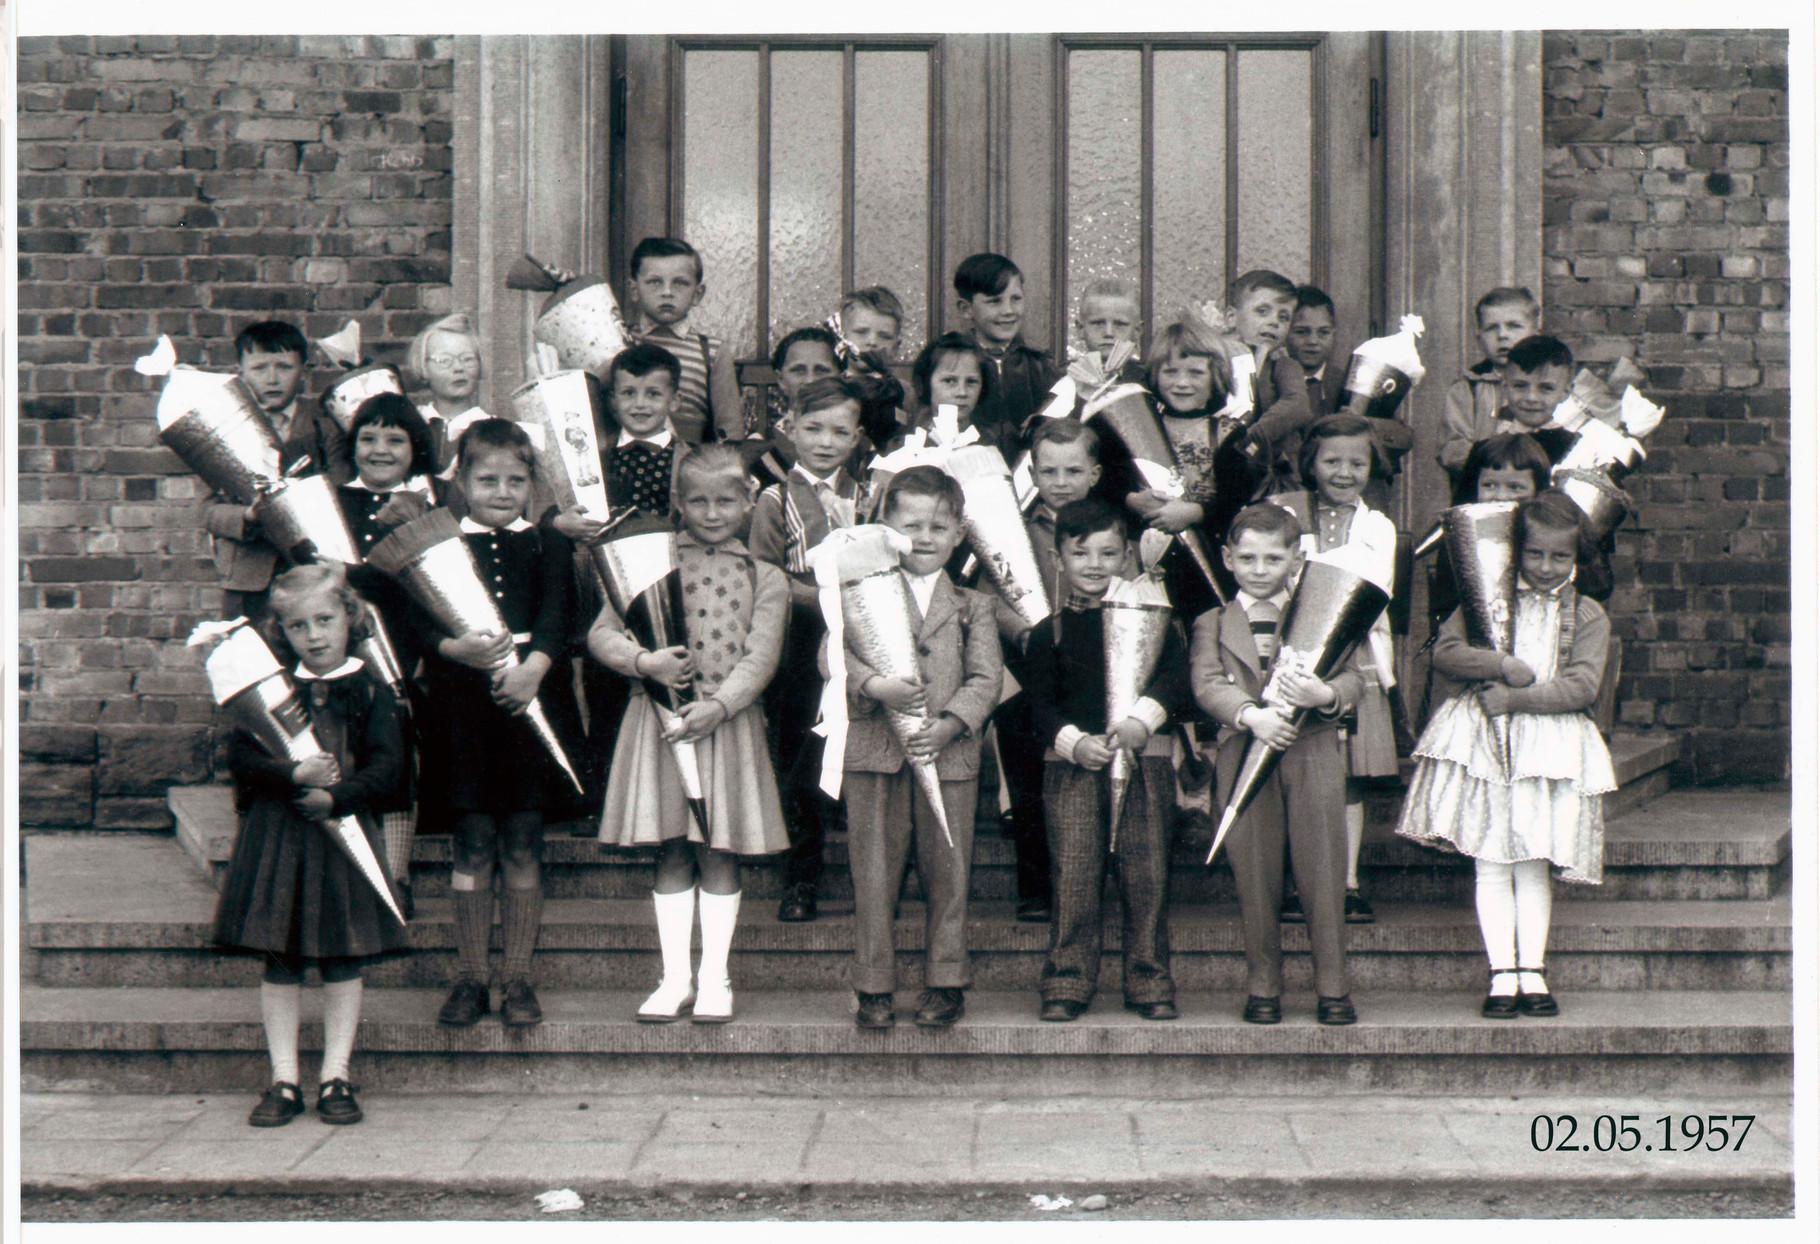 Jahrgang 1950, Bild: Reuter,Wolfram